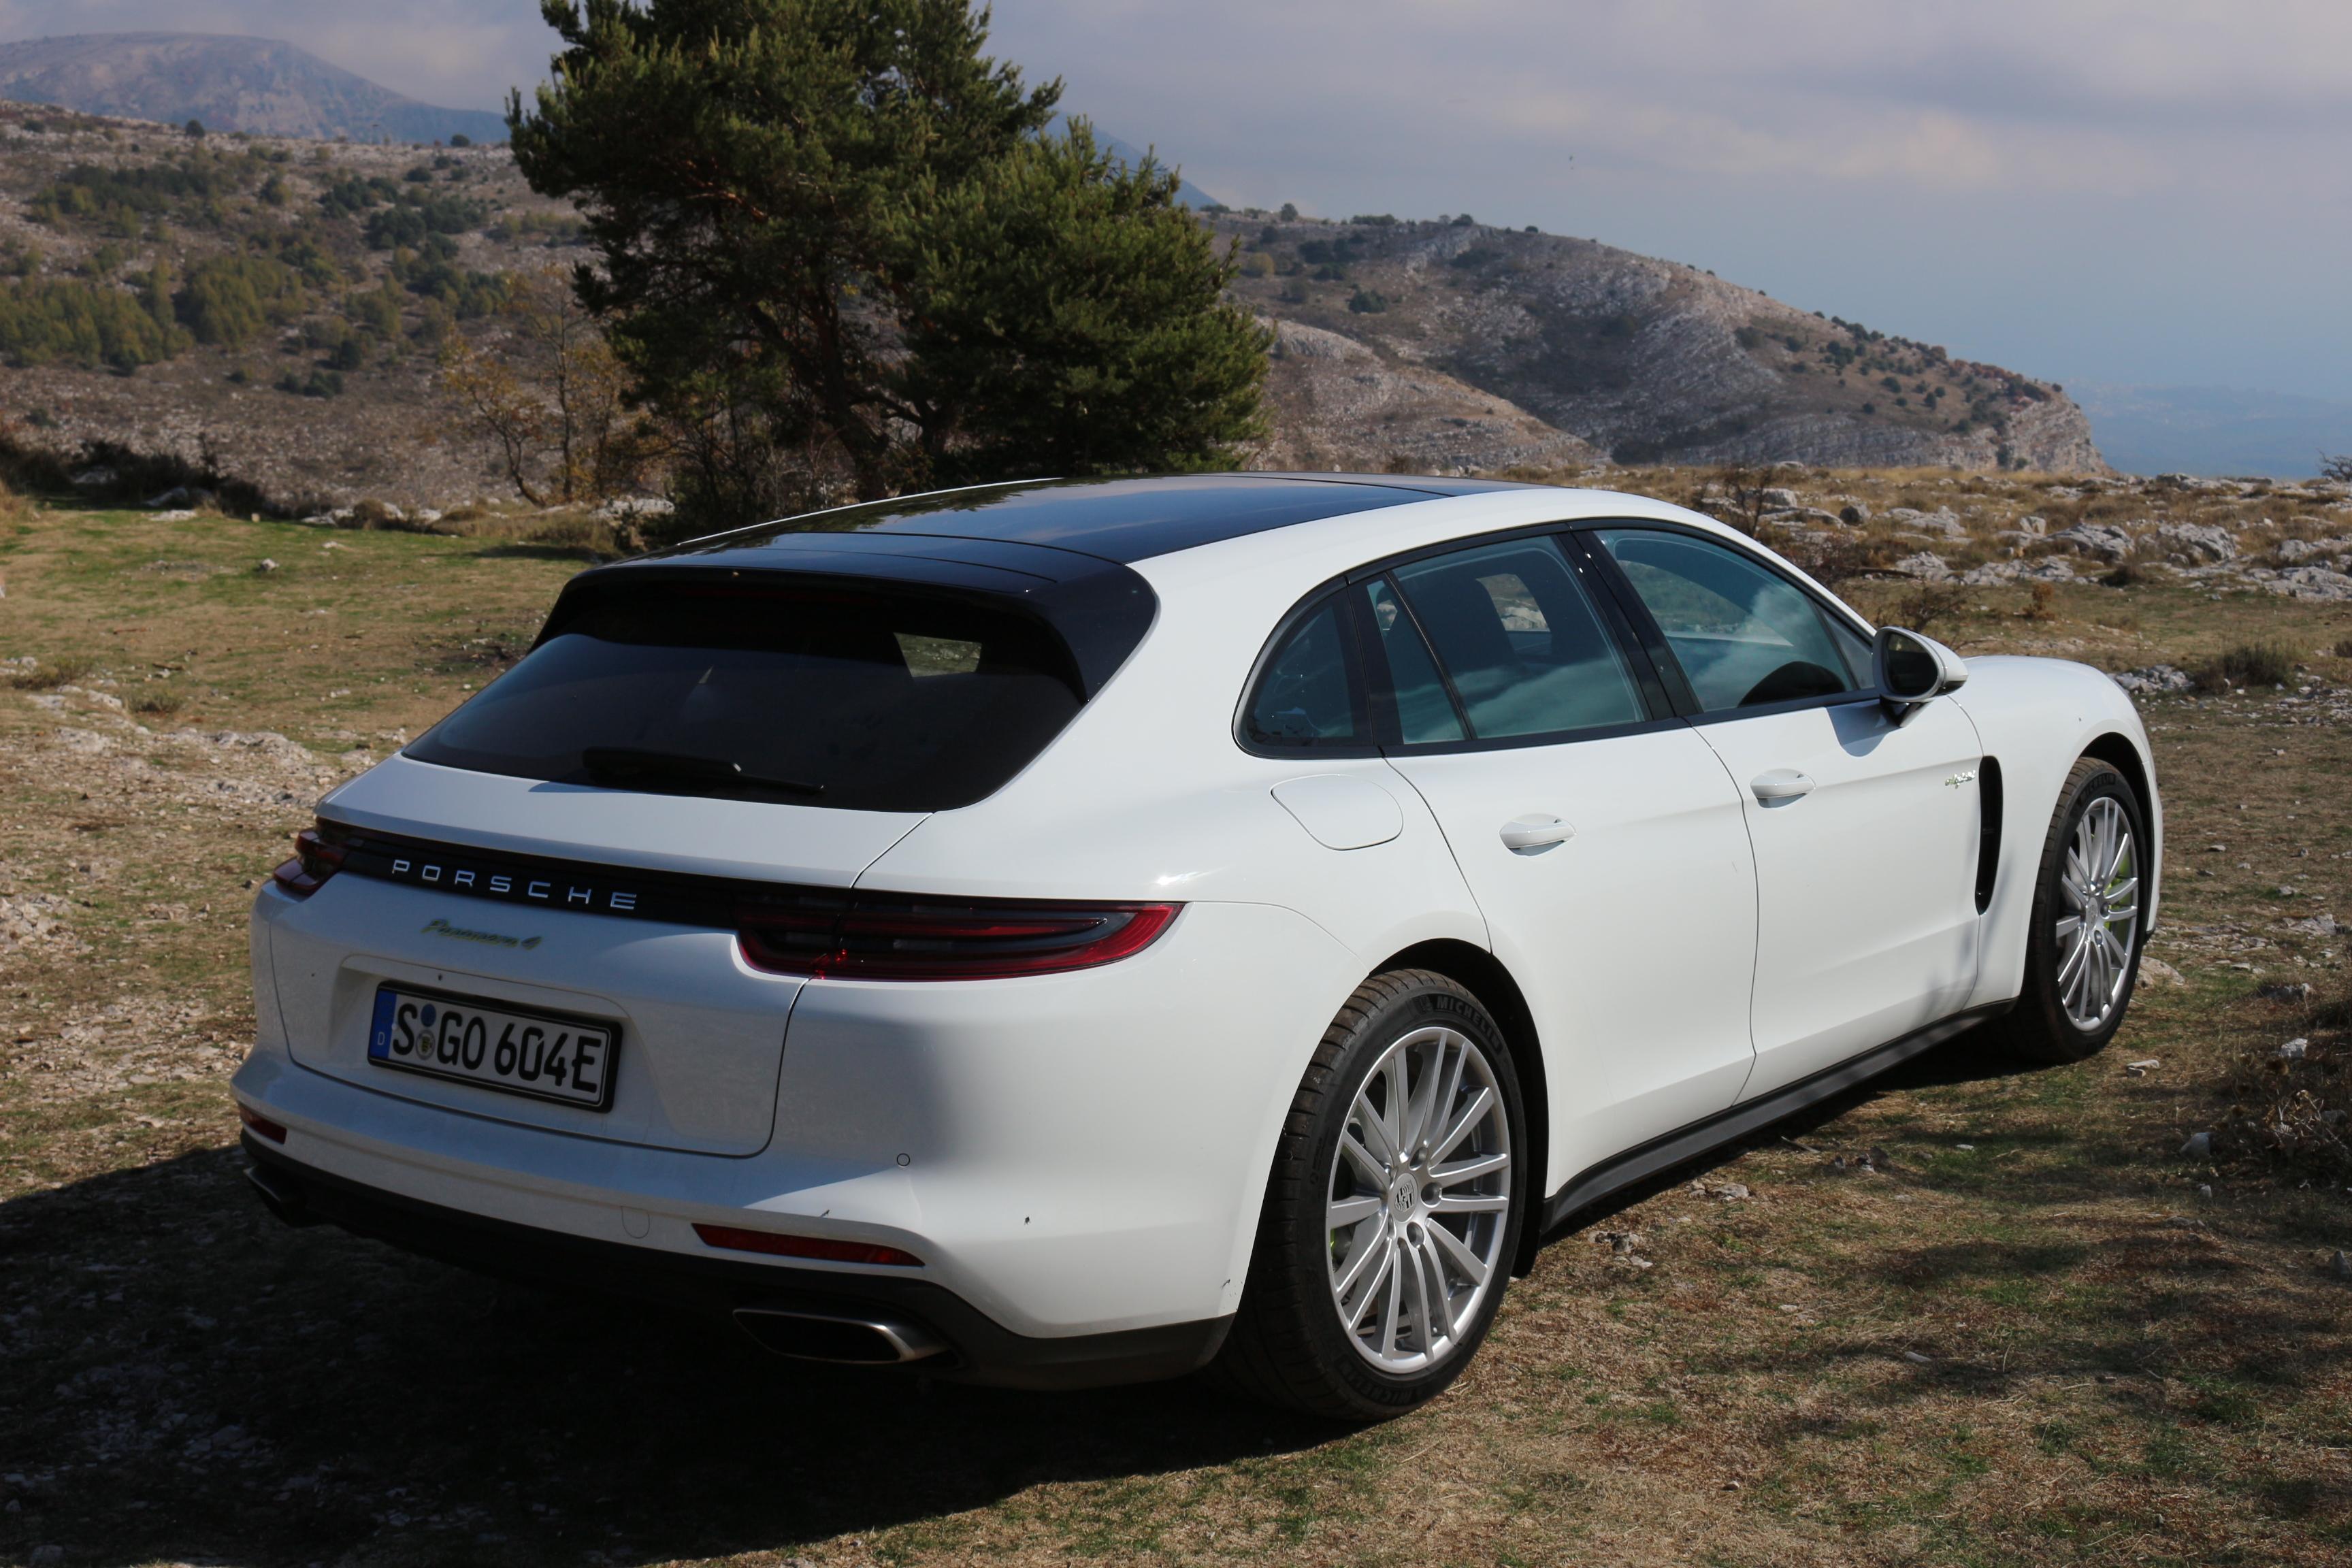 Essai vid o porsche panamera sport turismo coffre jouer - Porsche panamera 5 portes ...